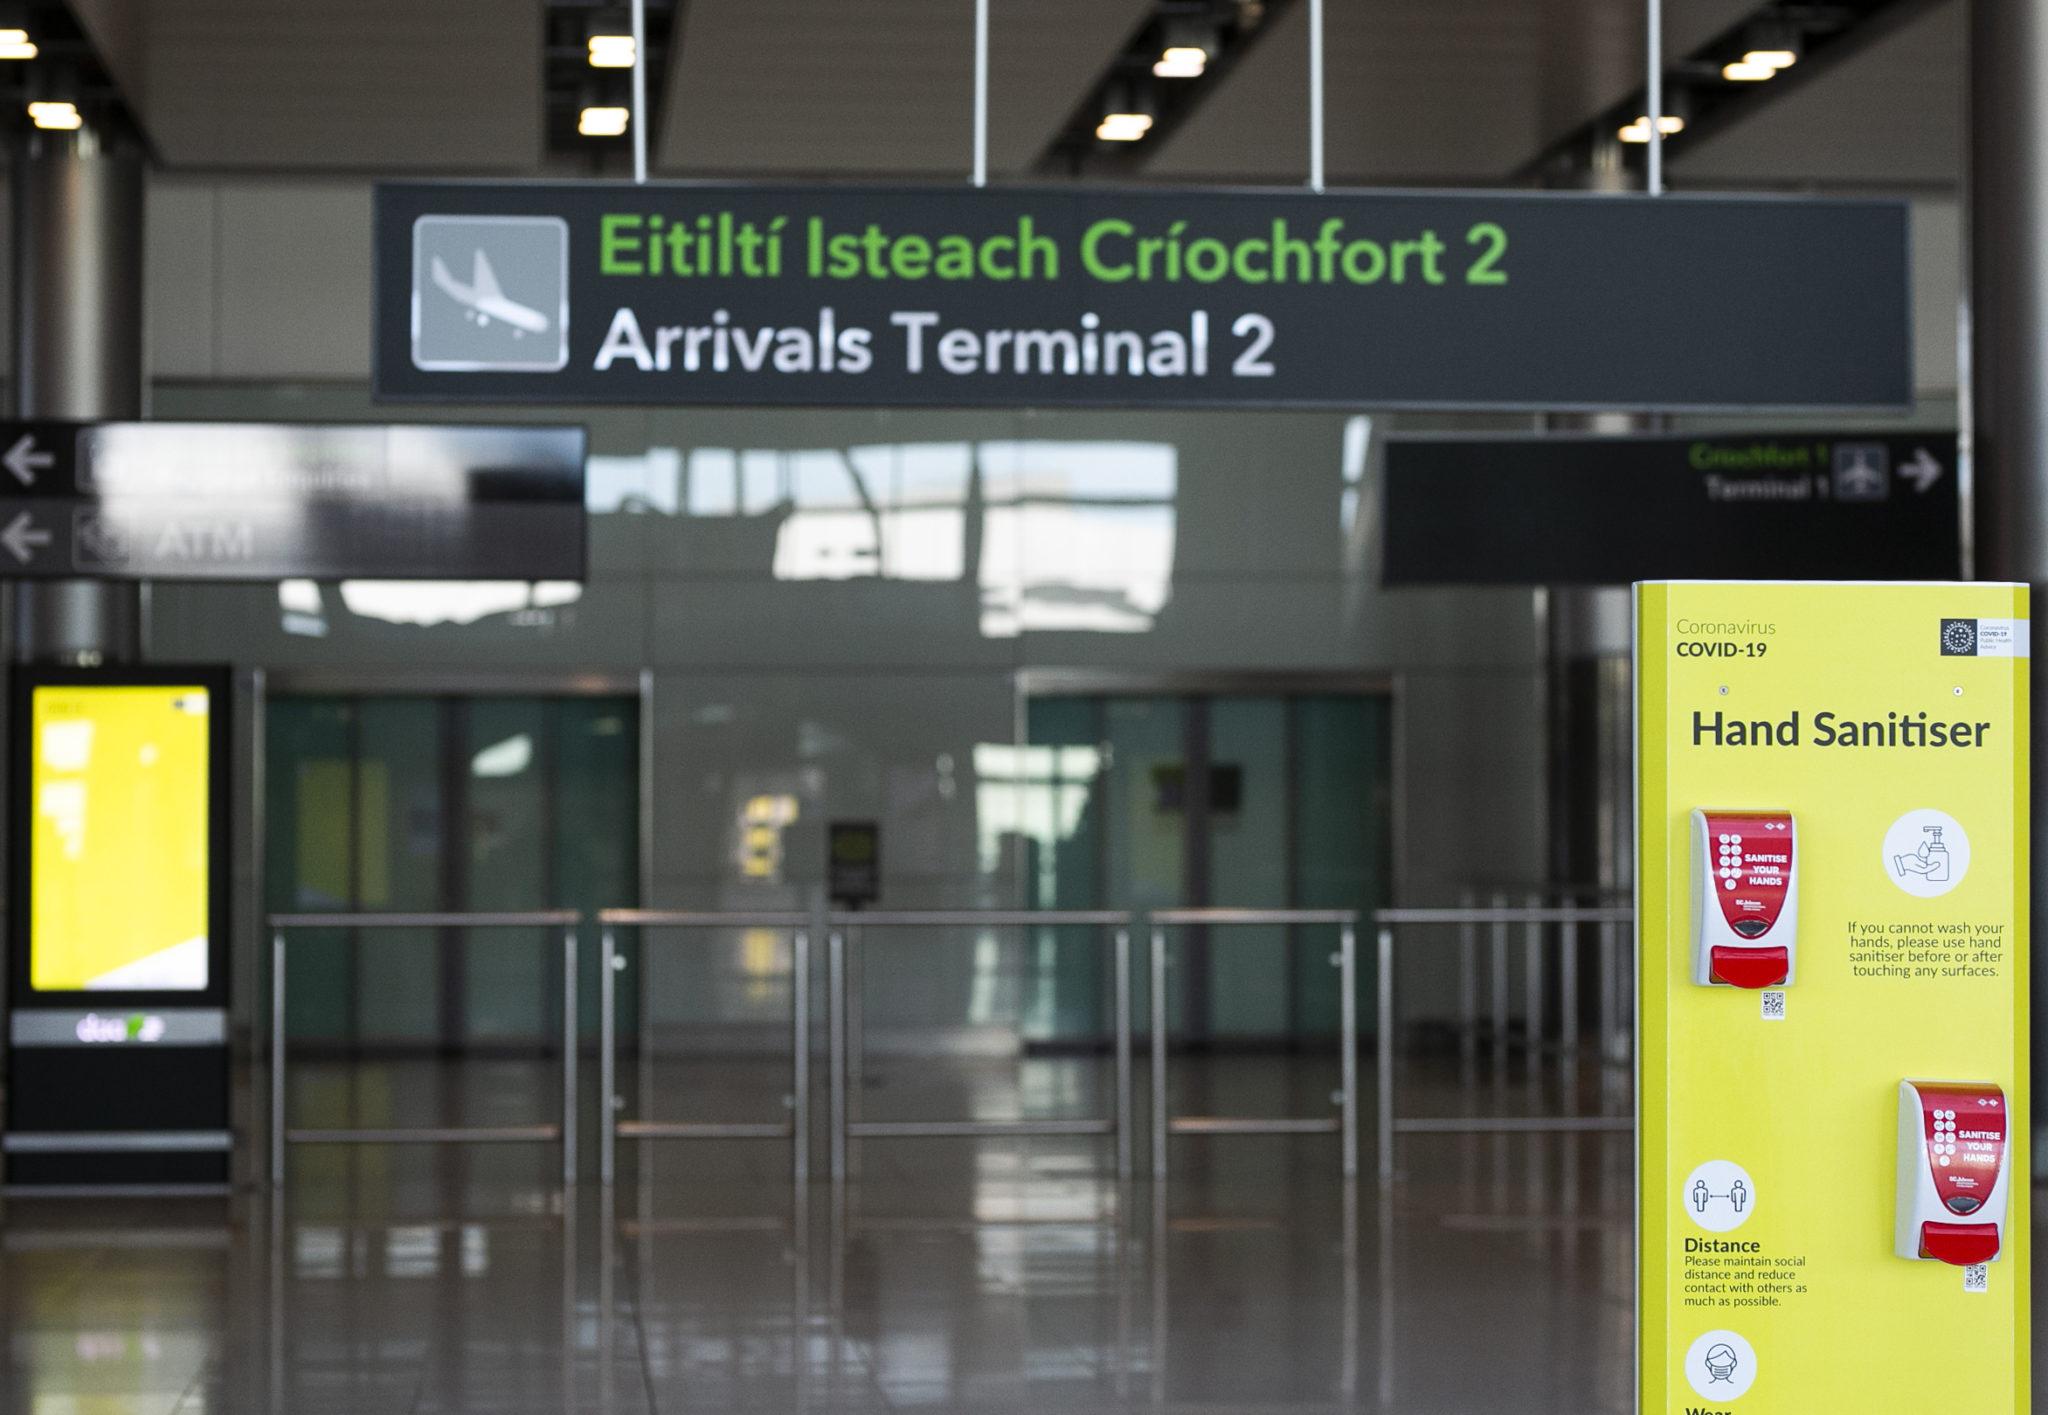 covid-19 variants Dublin Airport mandatory quarantine